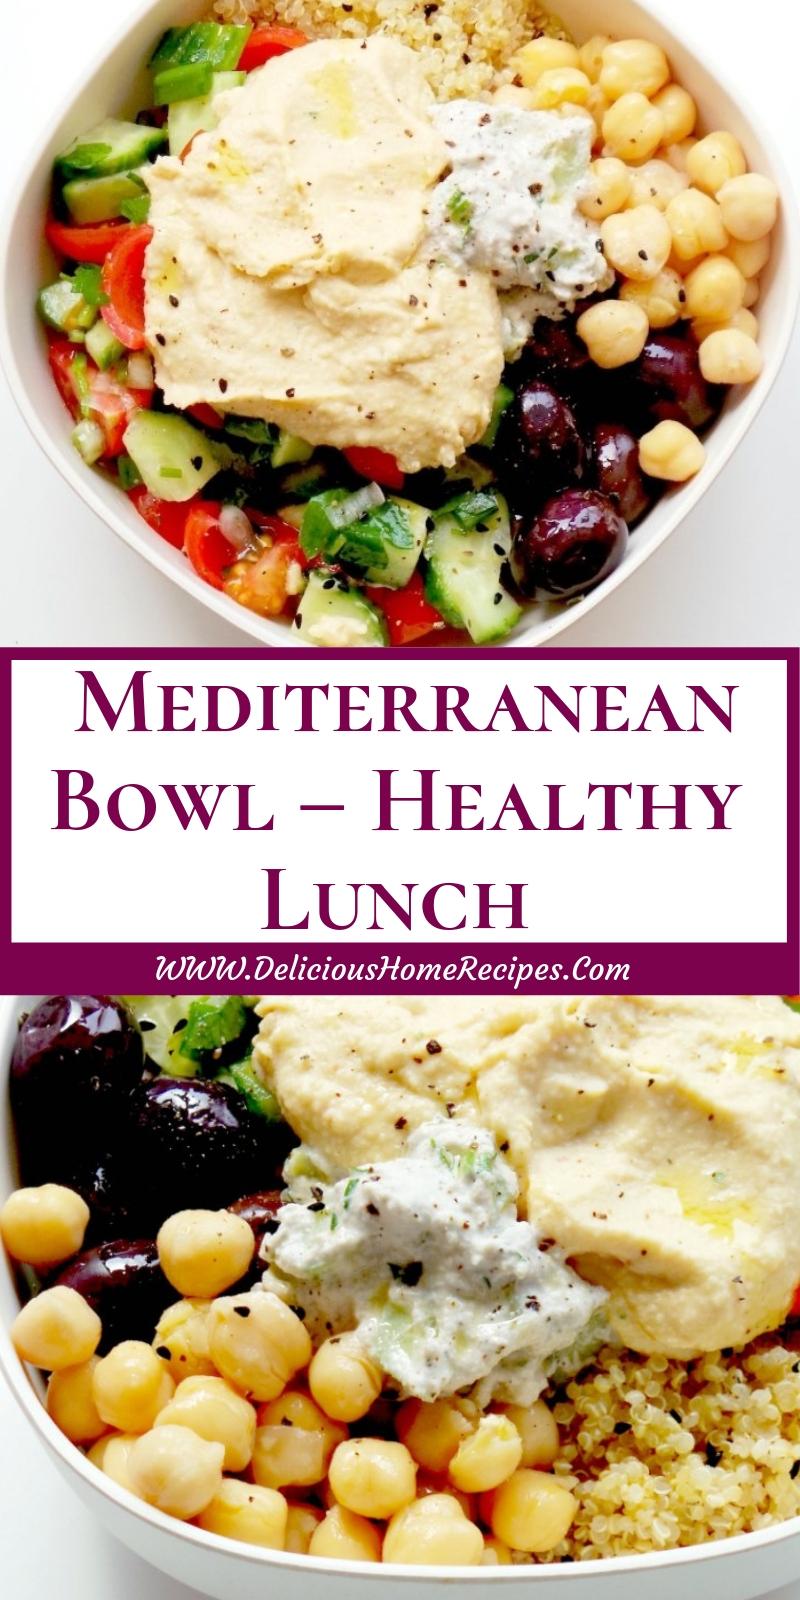 Mediterranean Bowl – Healthy Lunch